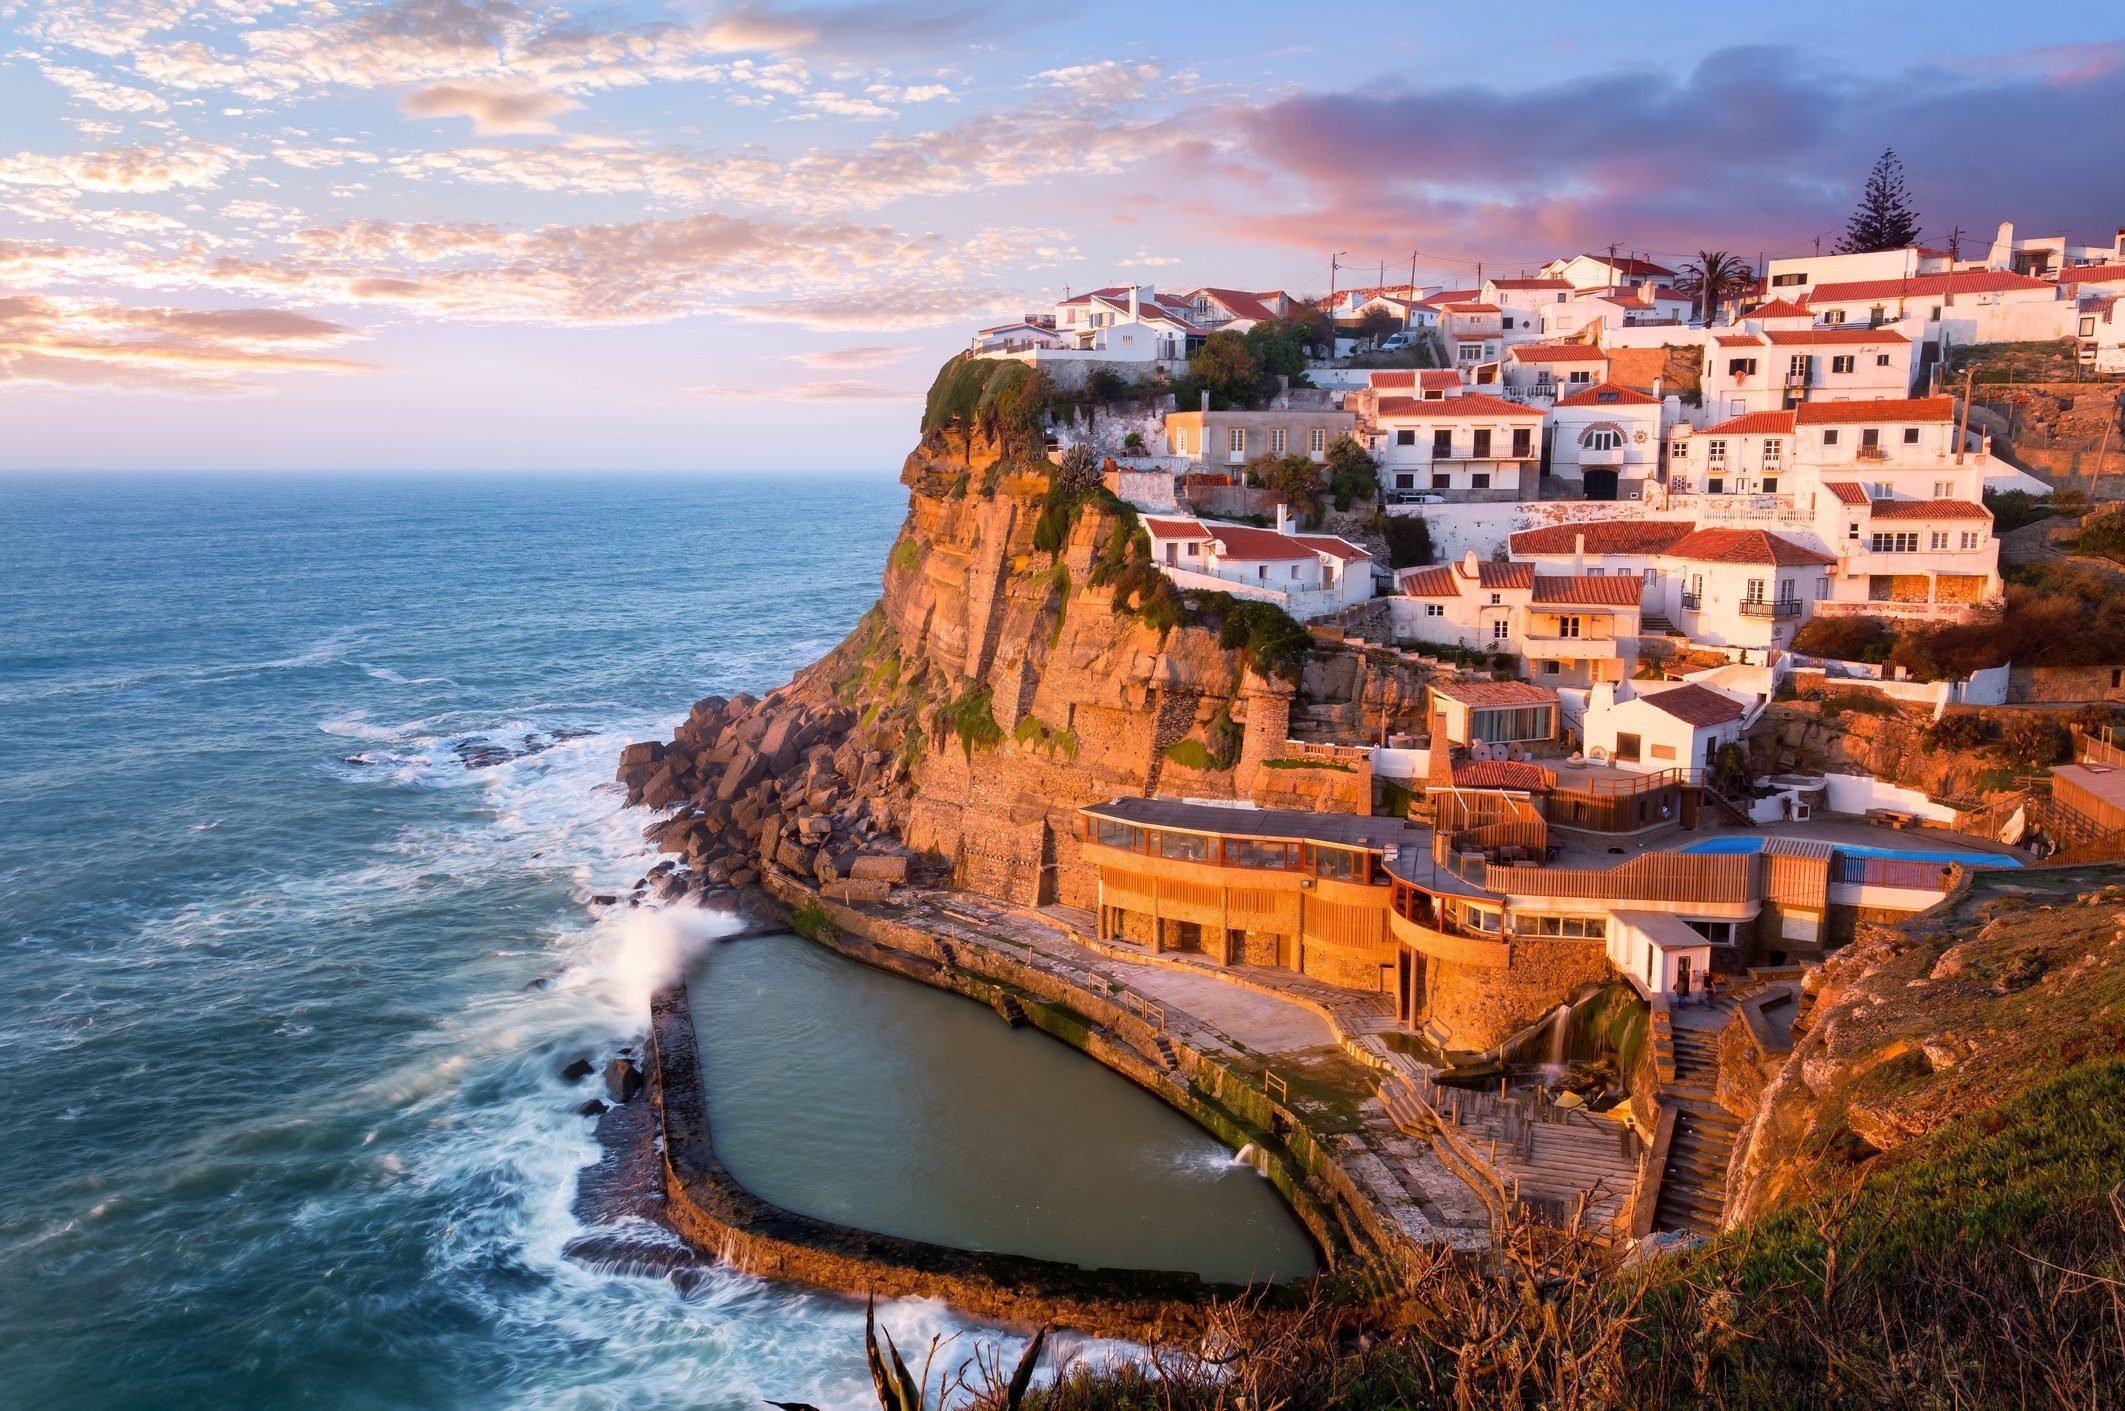 Pool at Azenhas do Mar, Sintra, Portugal